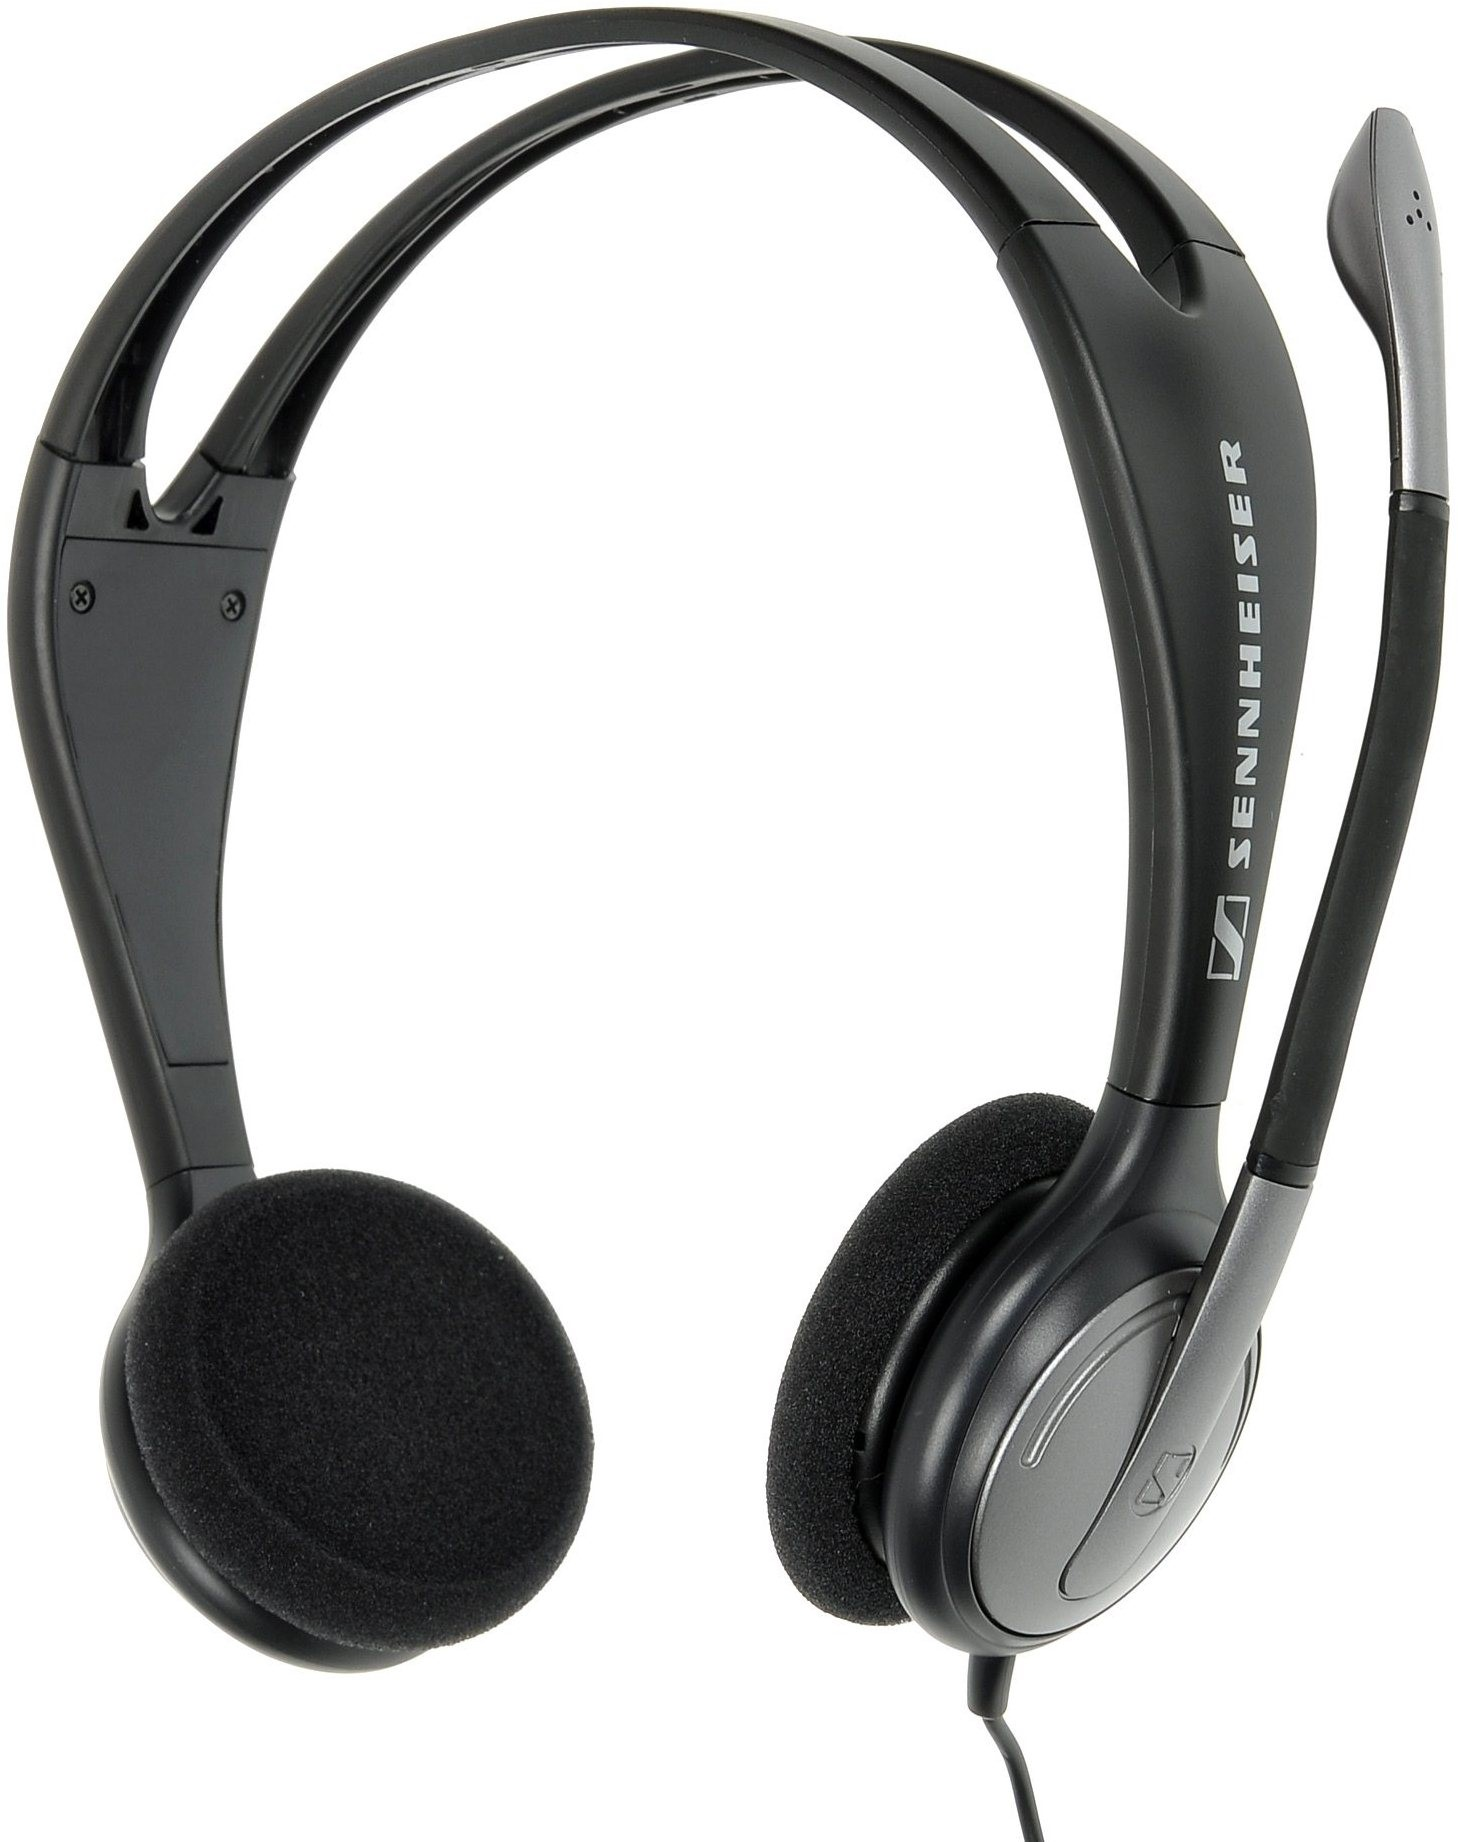 sennheiser pc 131 headphones with mic. Black Bedroom Furniture Sets. Home Design Ideas